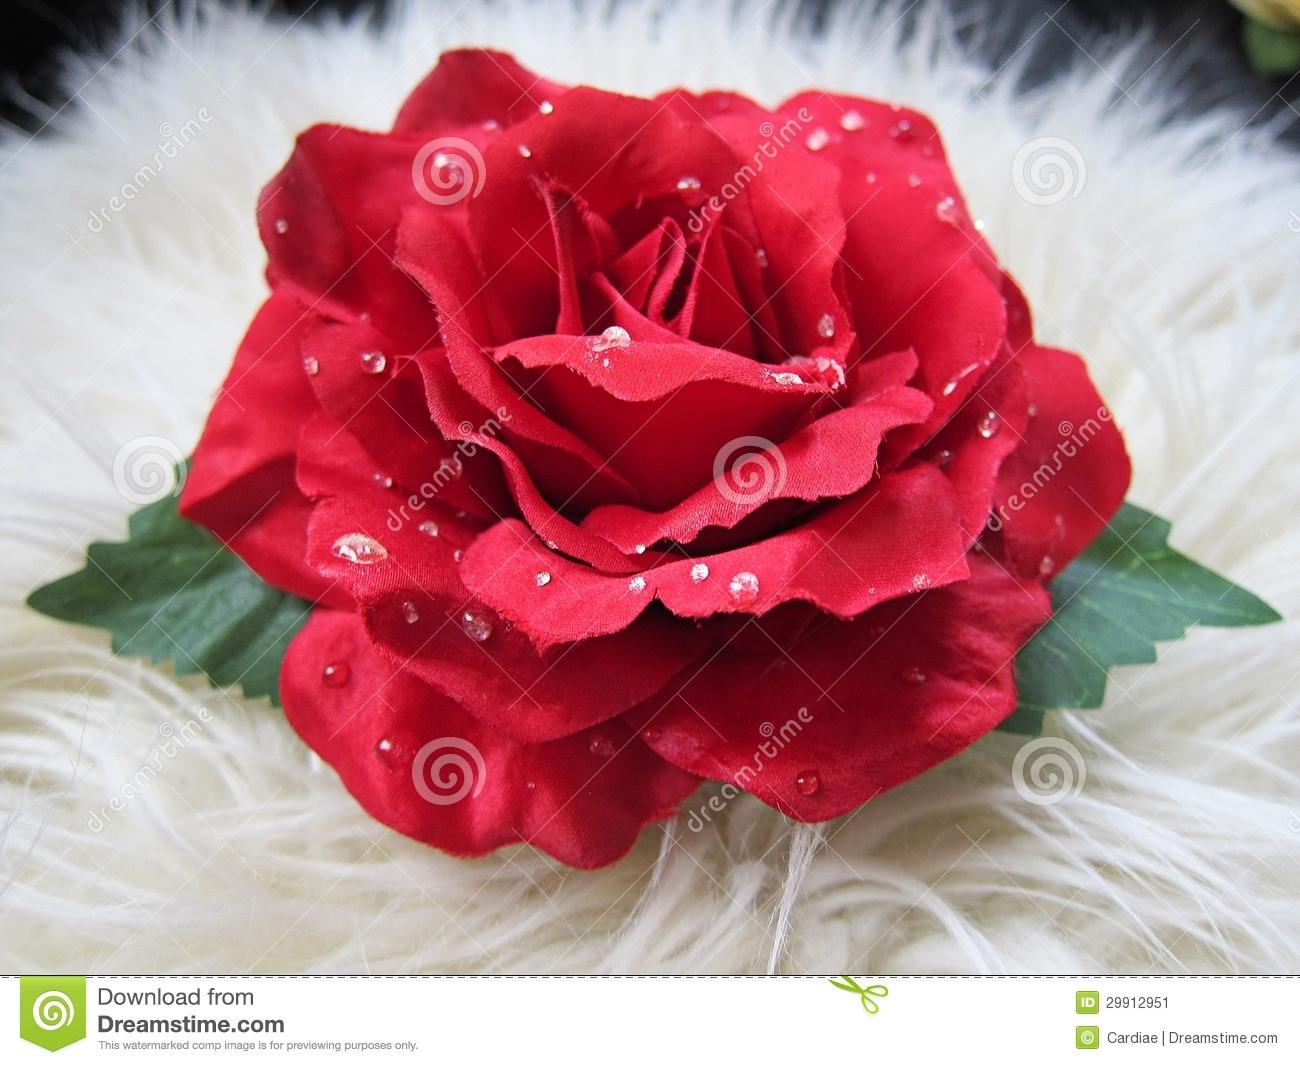 Red Flowers For Hair 5 Cool Wallpaper Hdflowerwallpaper